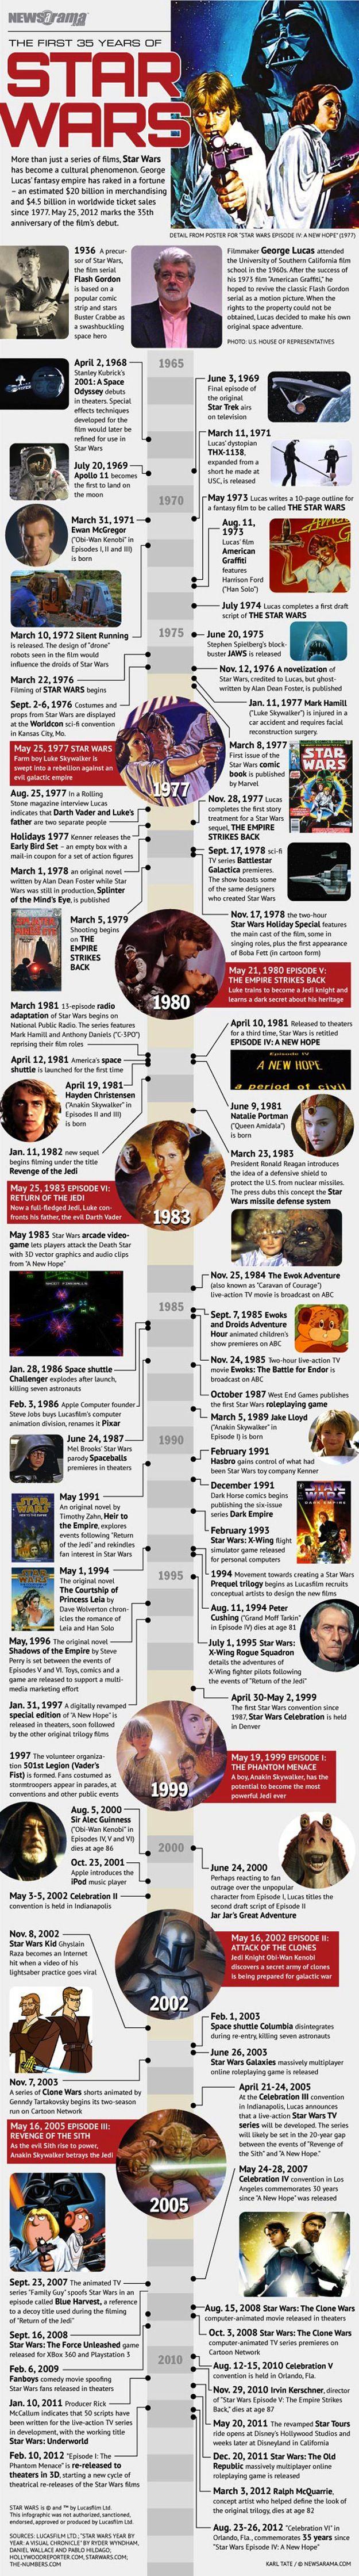 Star-Wars-35-Years-Infographic